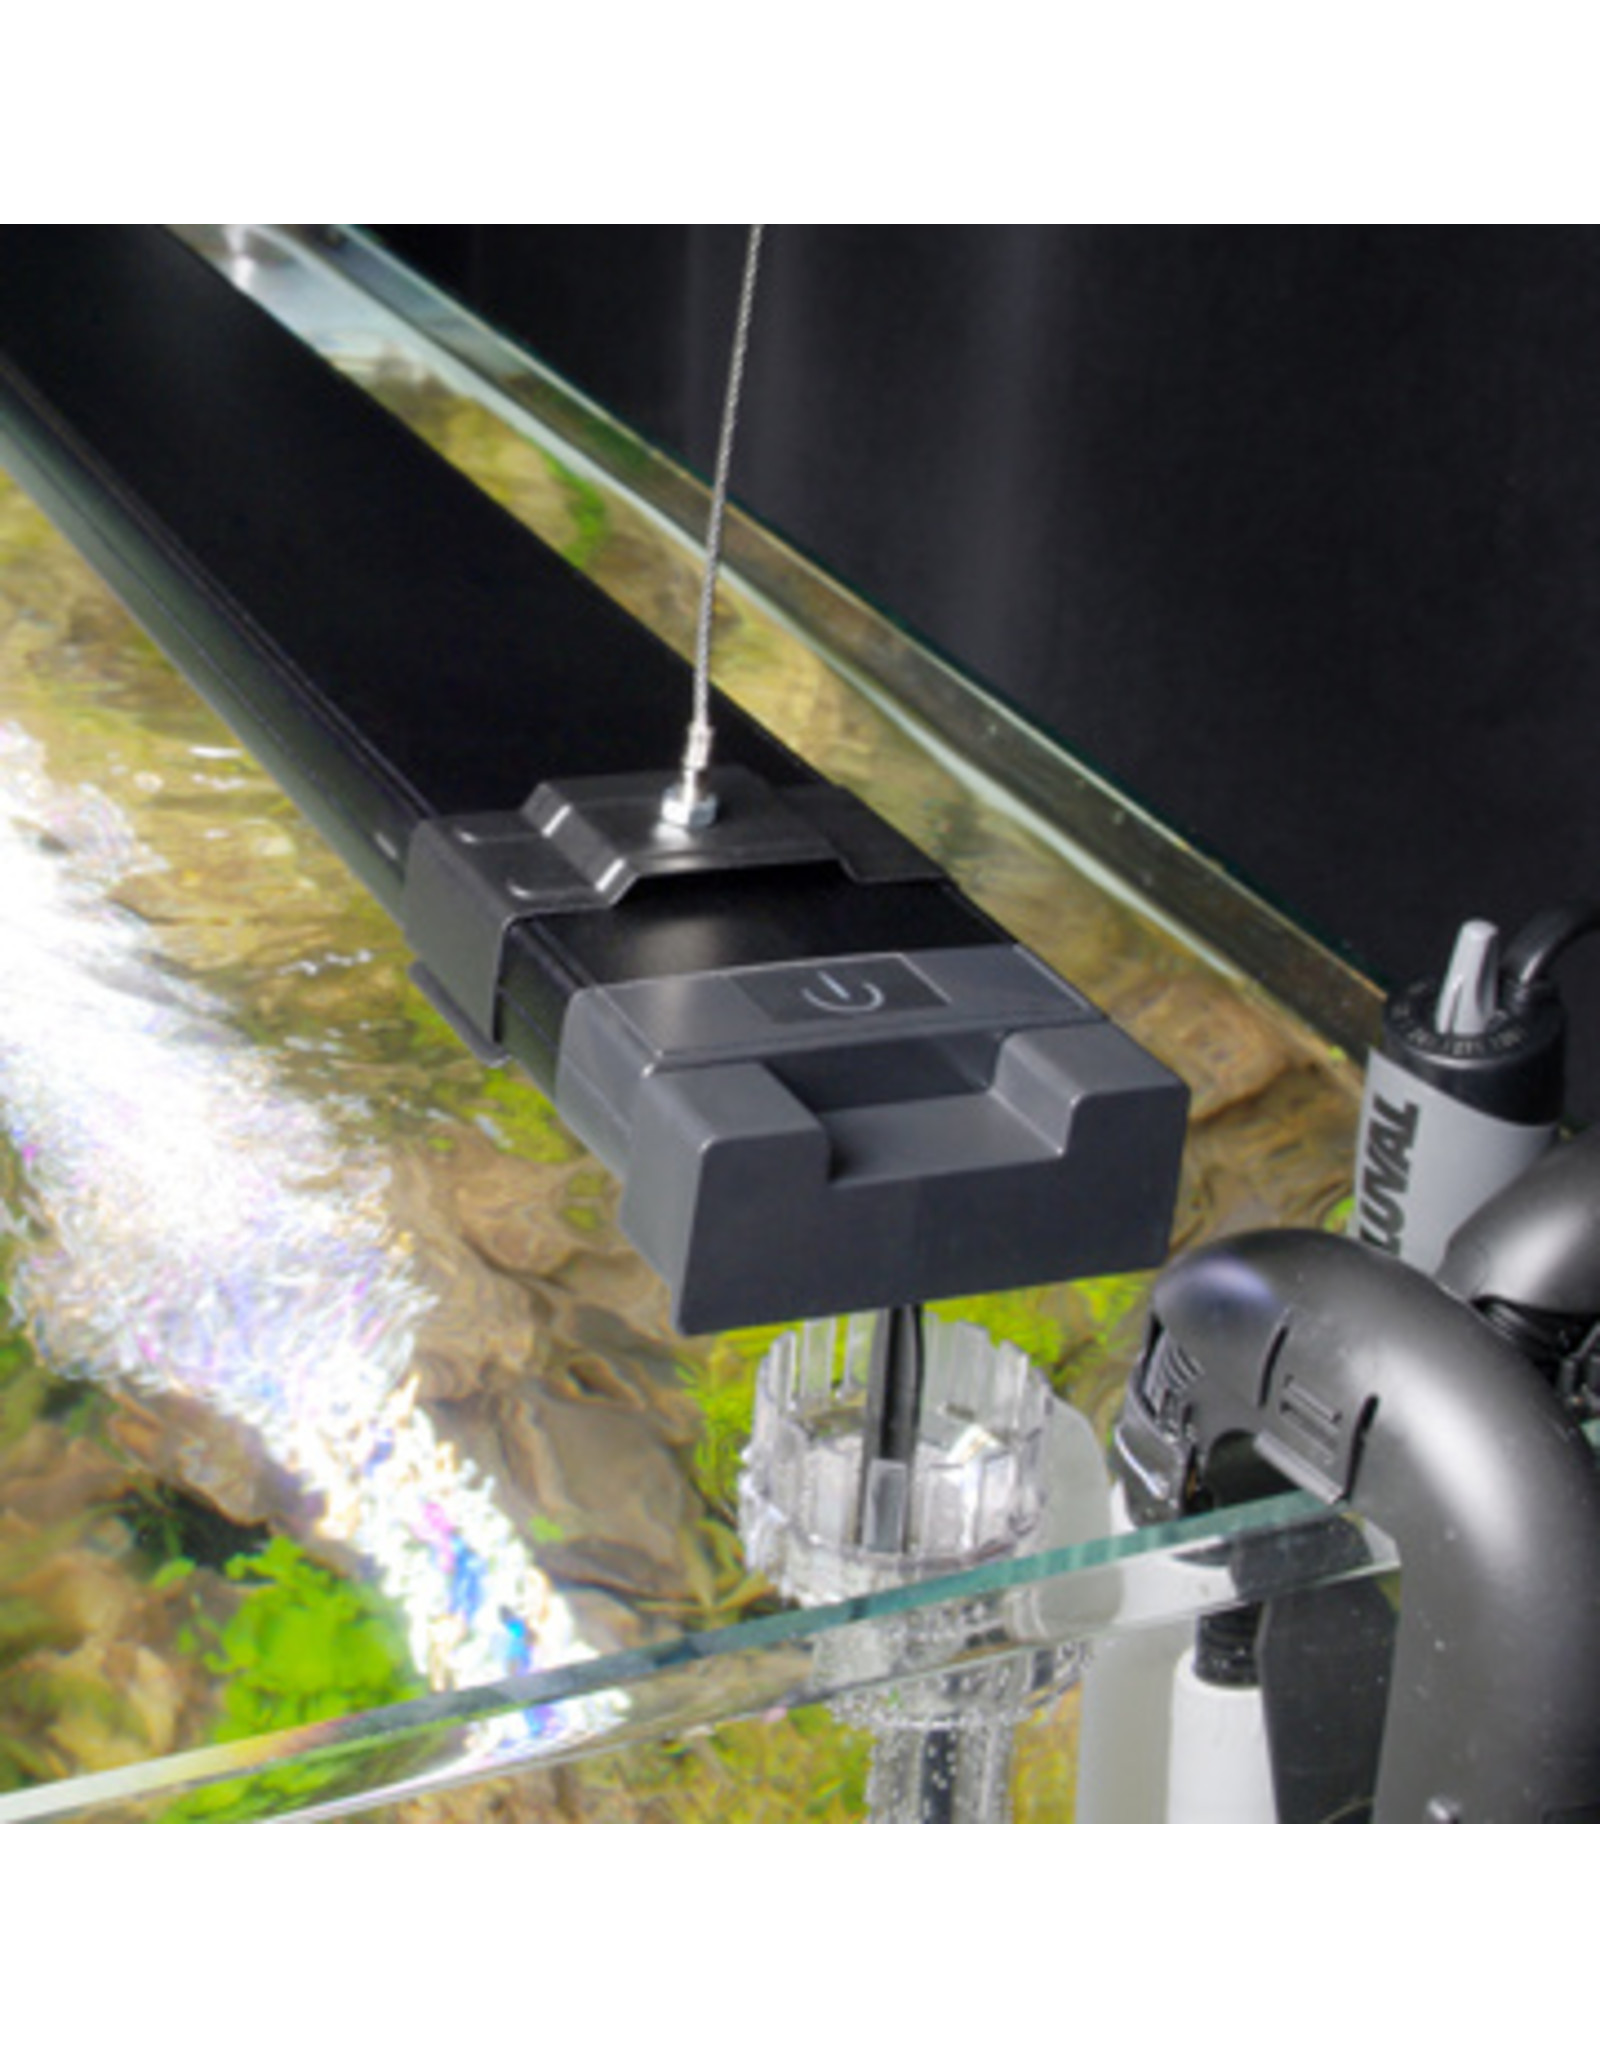 Fluval FLUVAL Cable Suspension Kit 140cm for Marina & Plant 3.0 LED